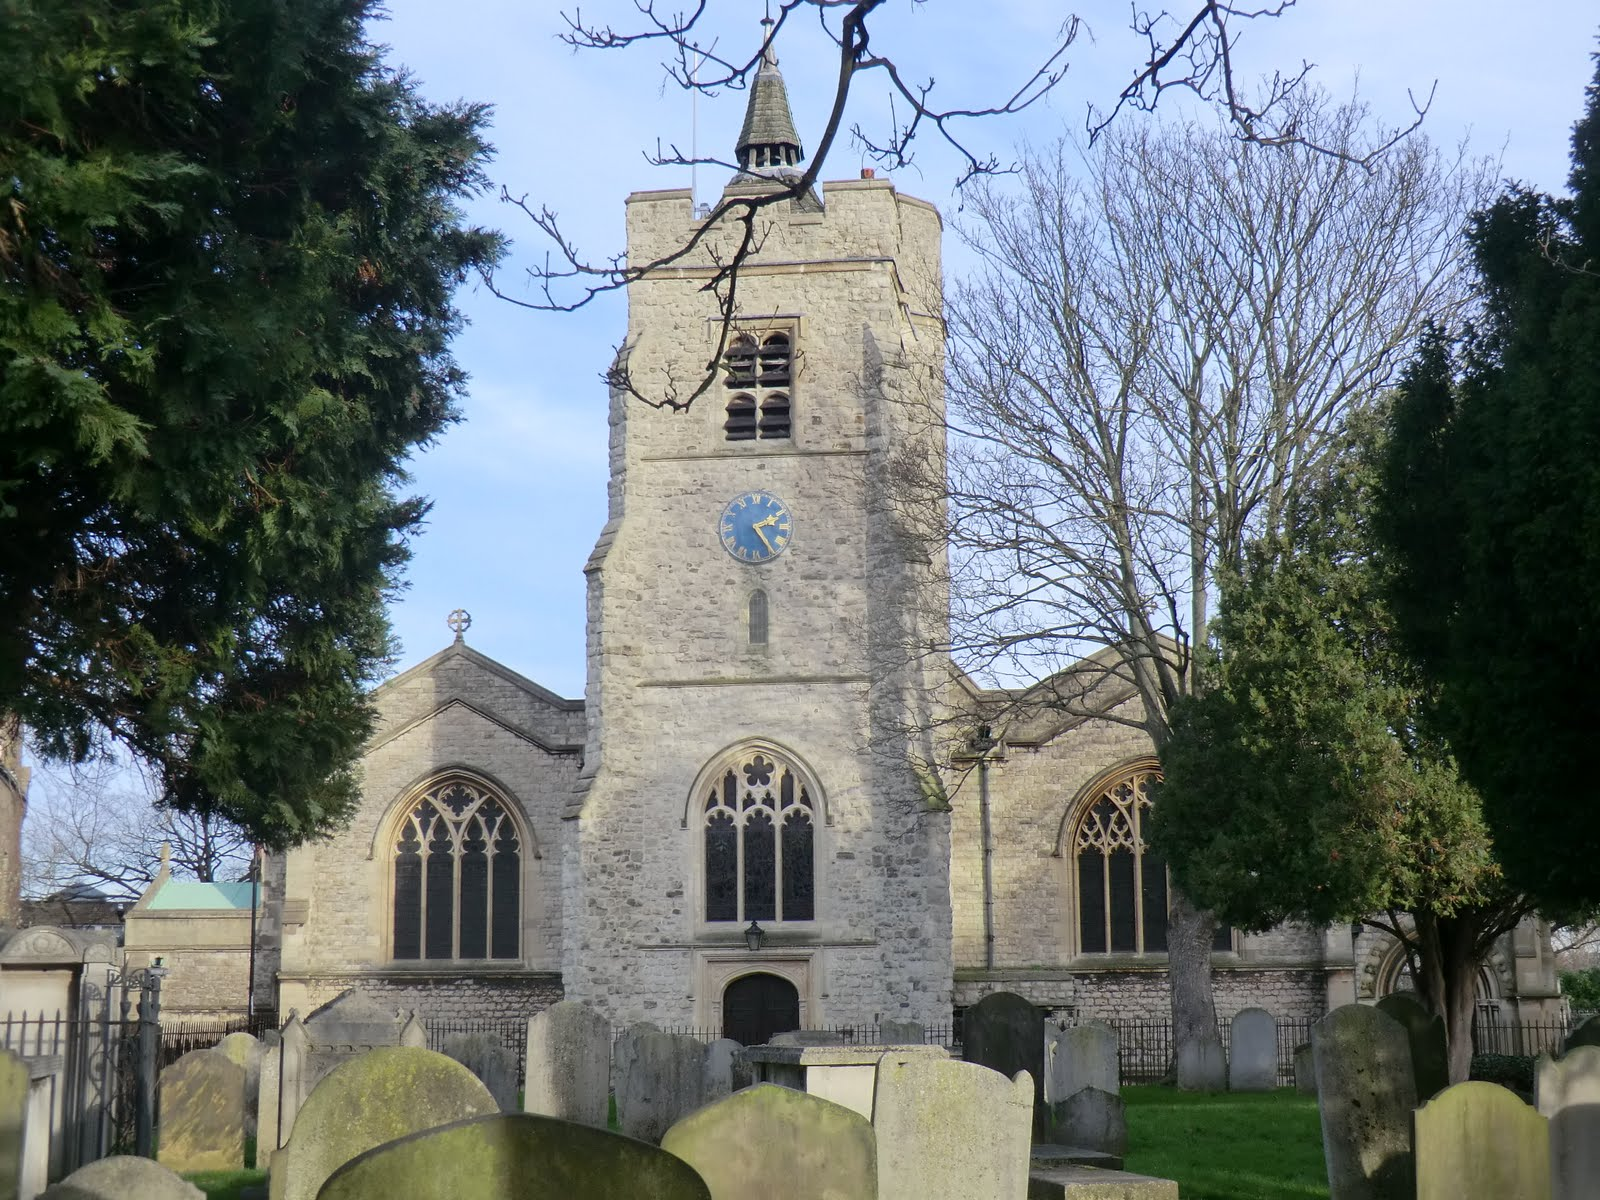 CIMG2159 St Nicholas church, Chiswick